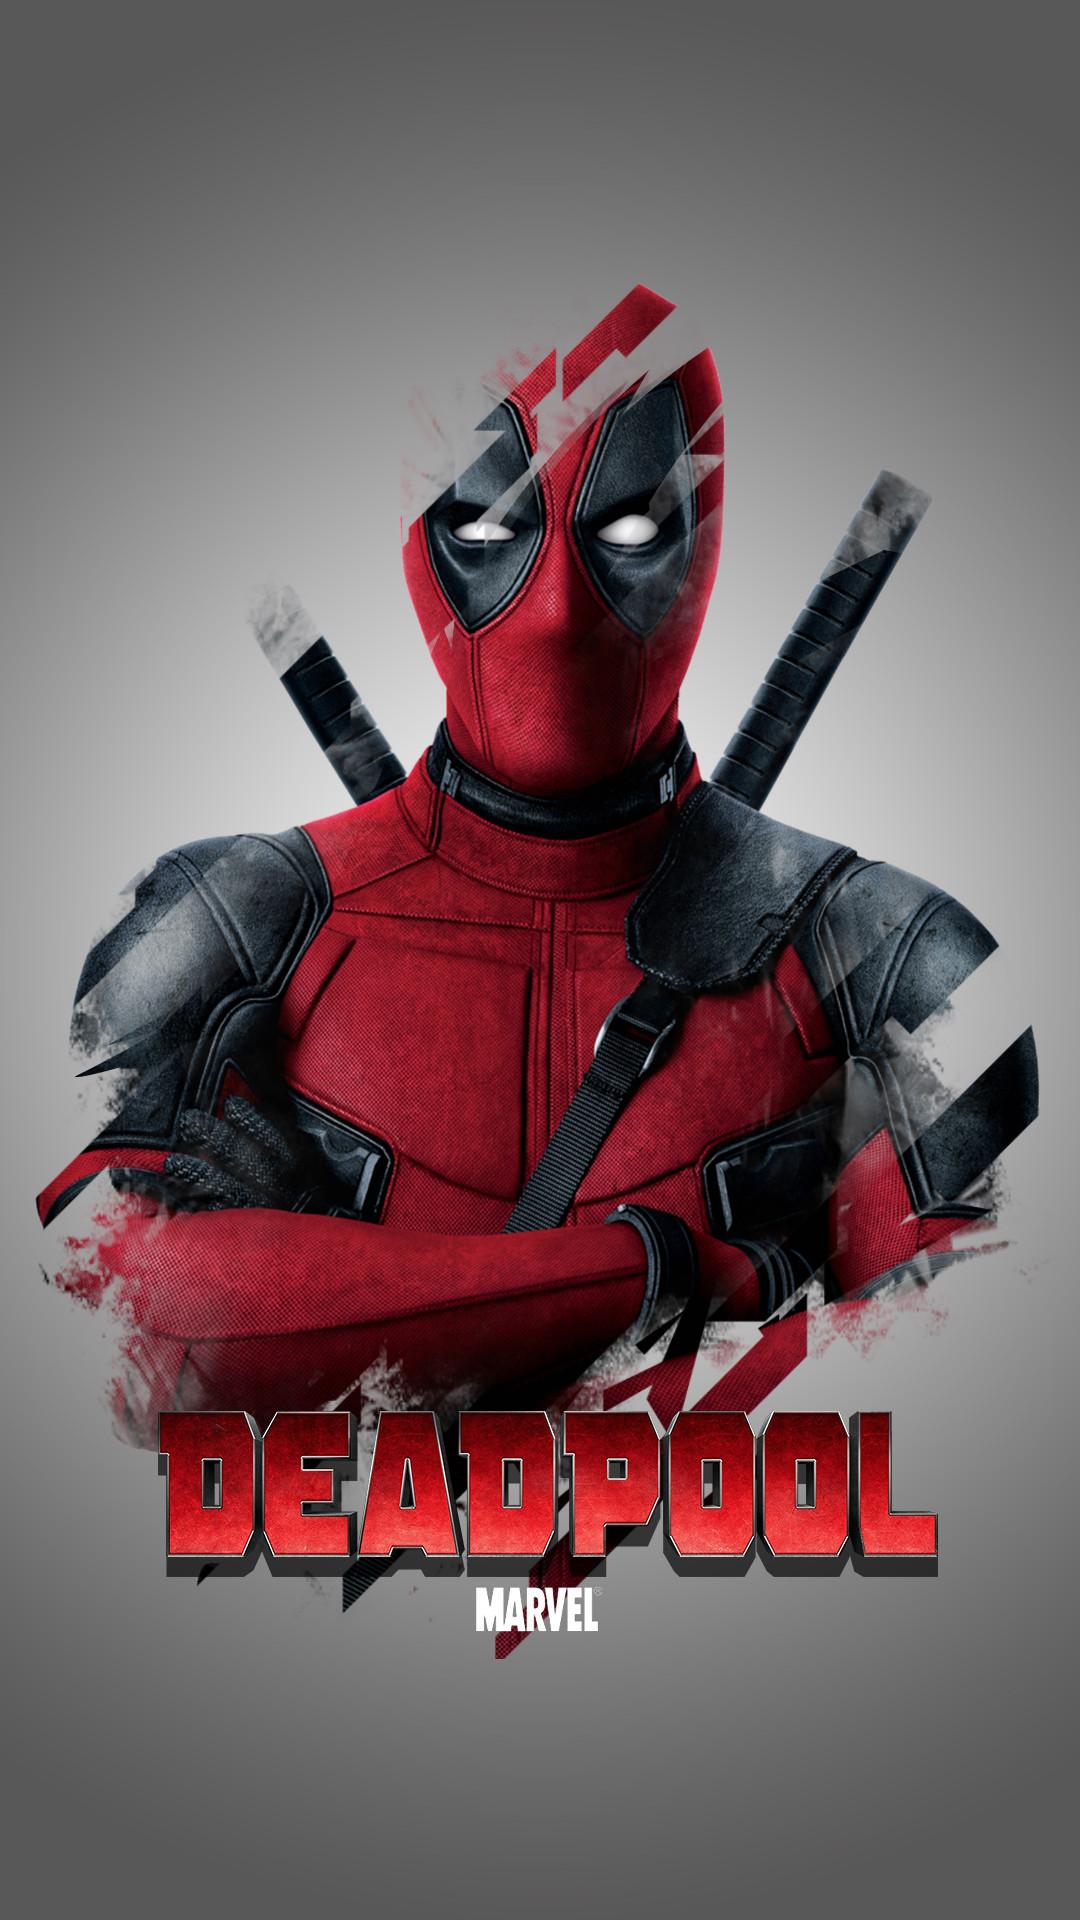 Deadpool Mobile Wallpaper 4k 2859938 Hd Wallpaper Backgrounds Download